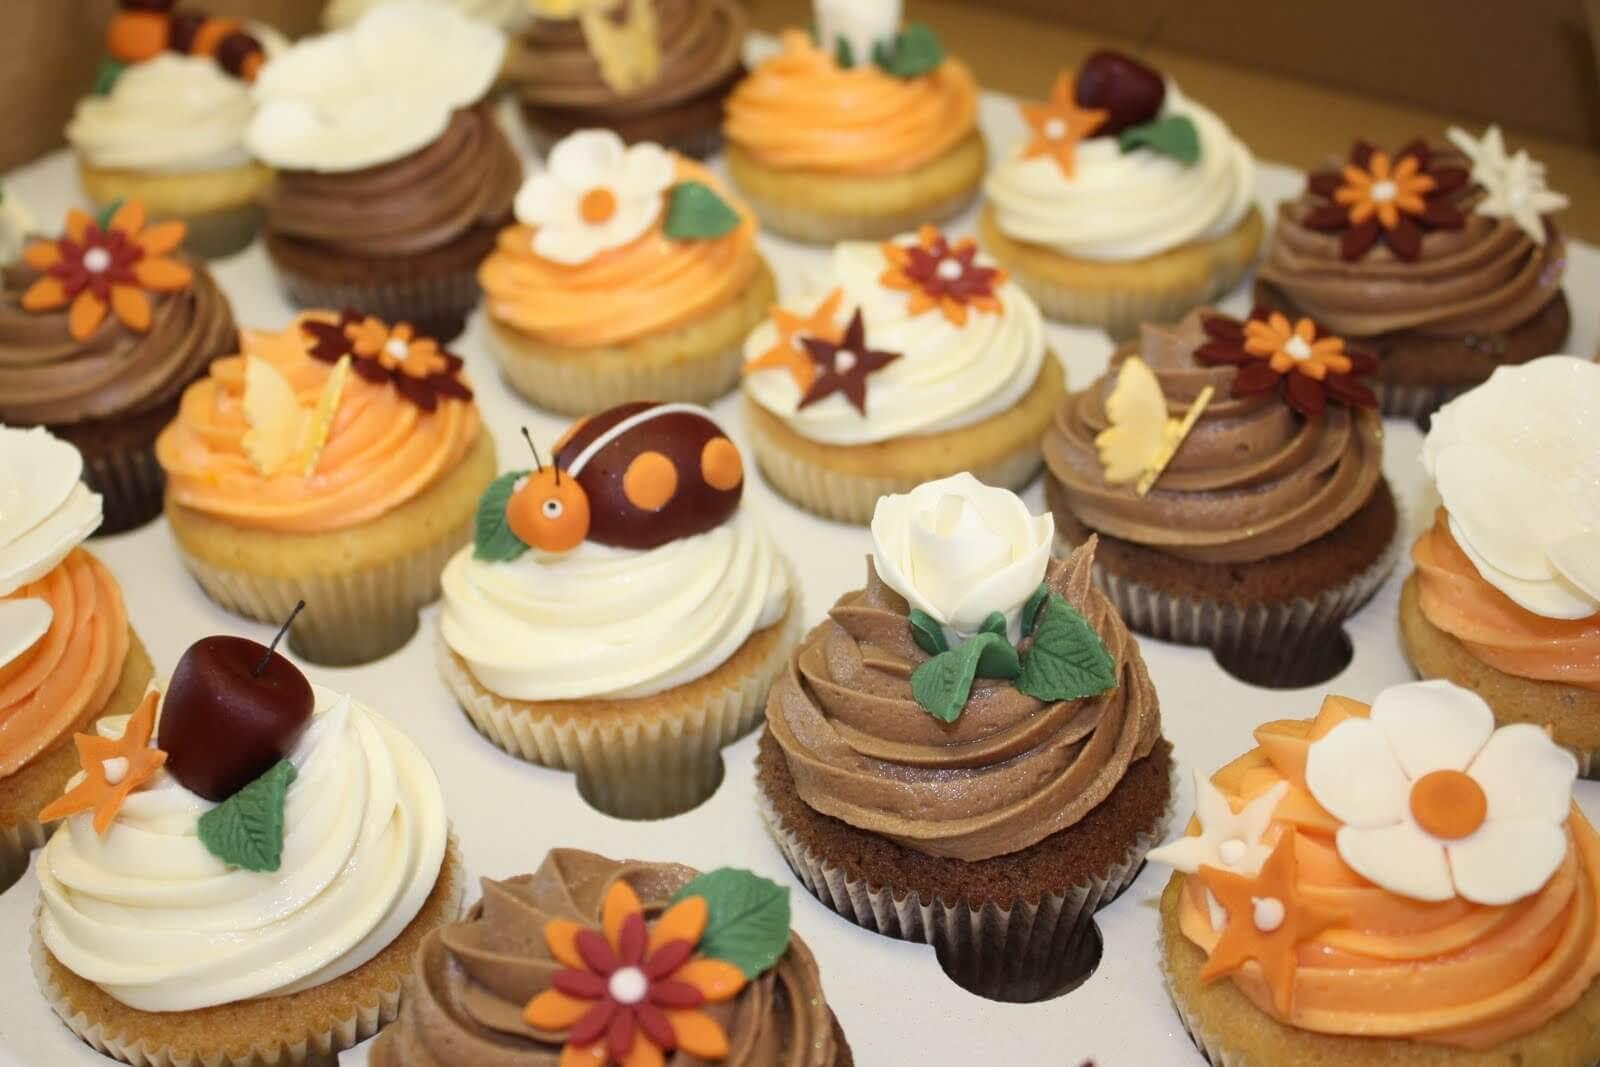 25 Fabulous Autumn Fall Cupcakes  29 Fall Themed Cupcakes for This Season